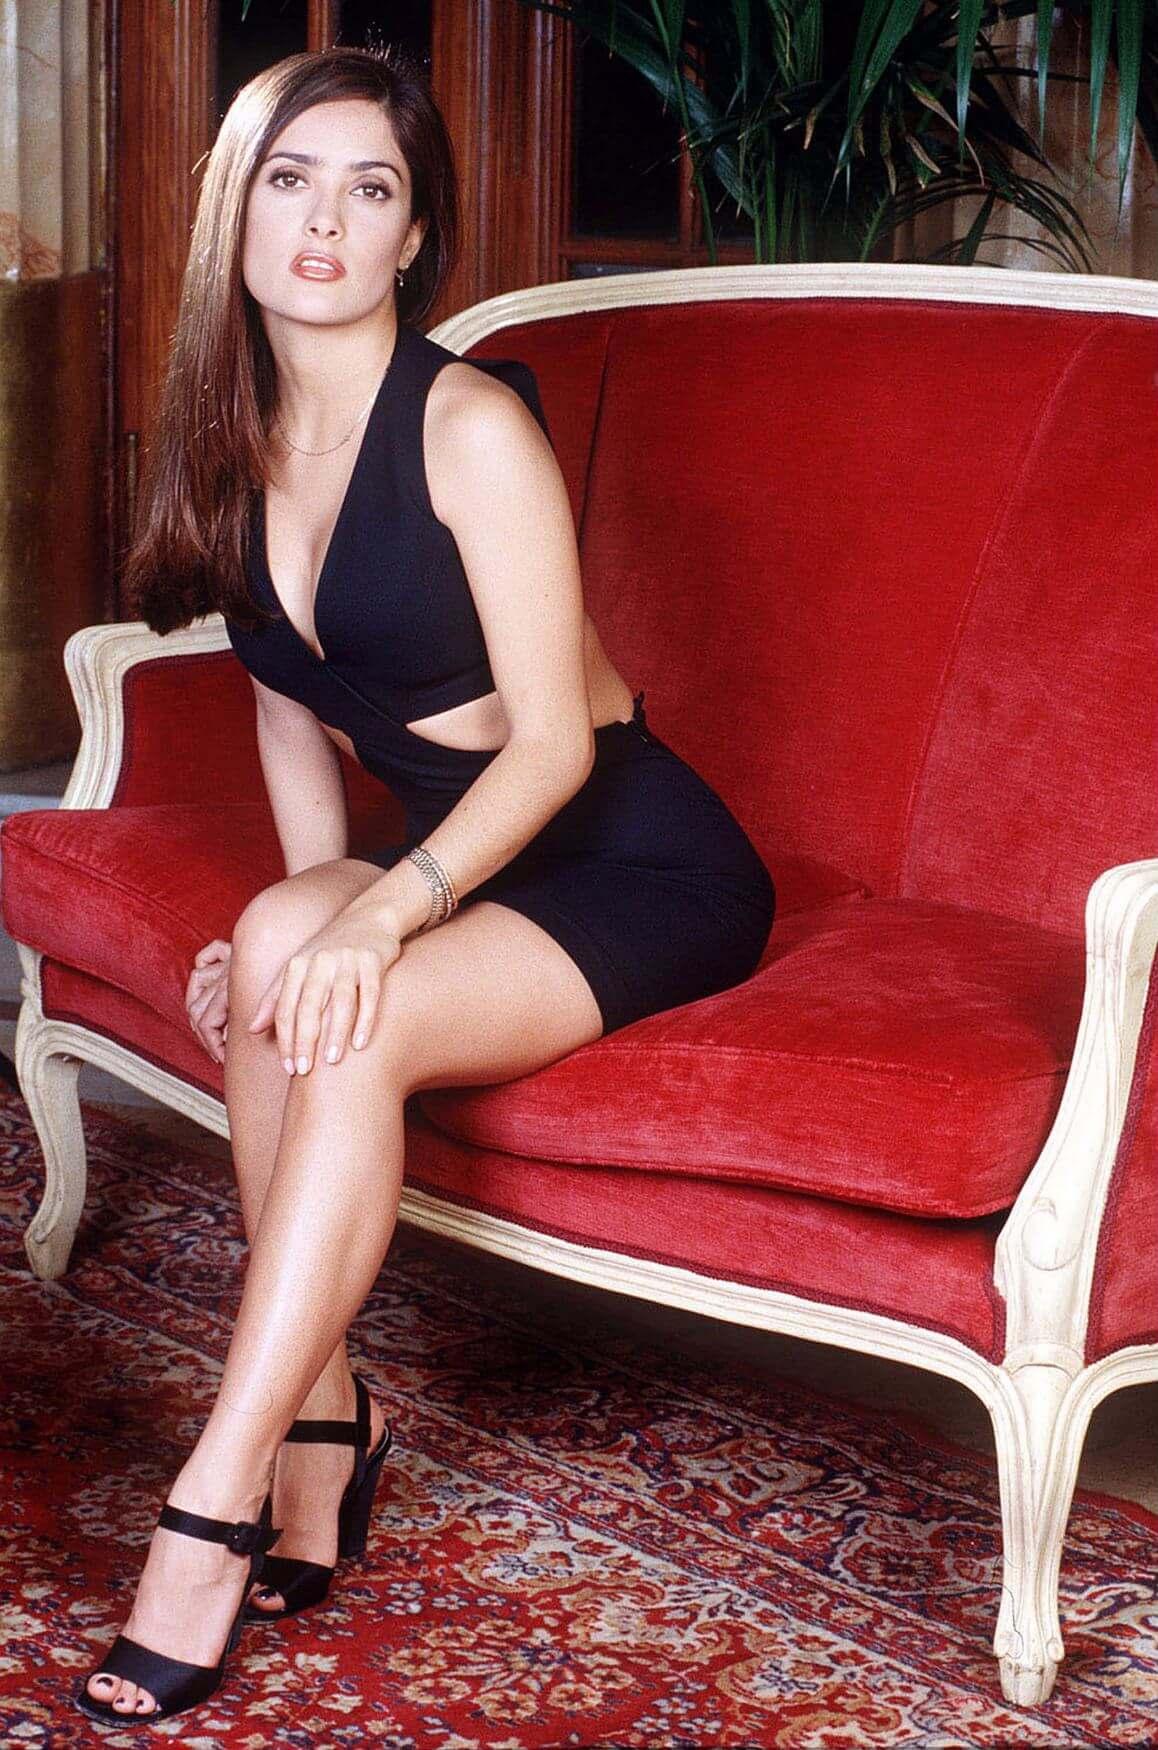 50 Hot Salma Hayek Photos Will Make YOur Day Better - 12thBlog